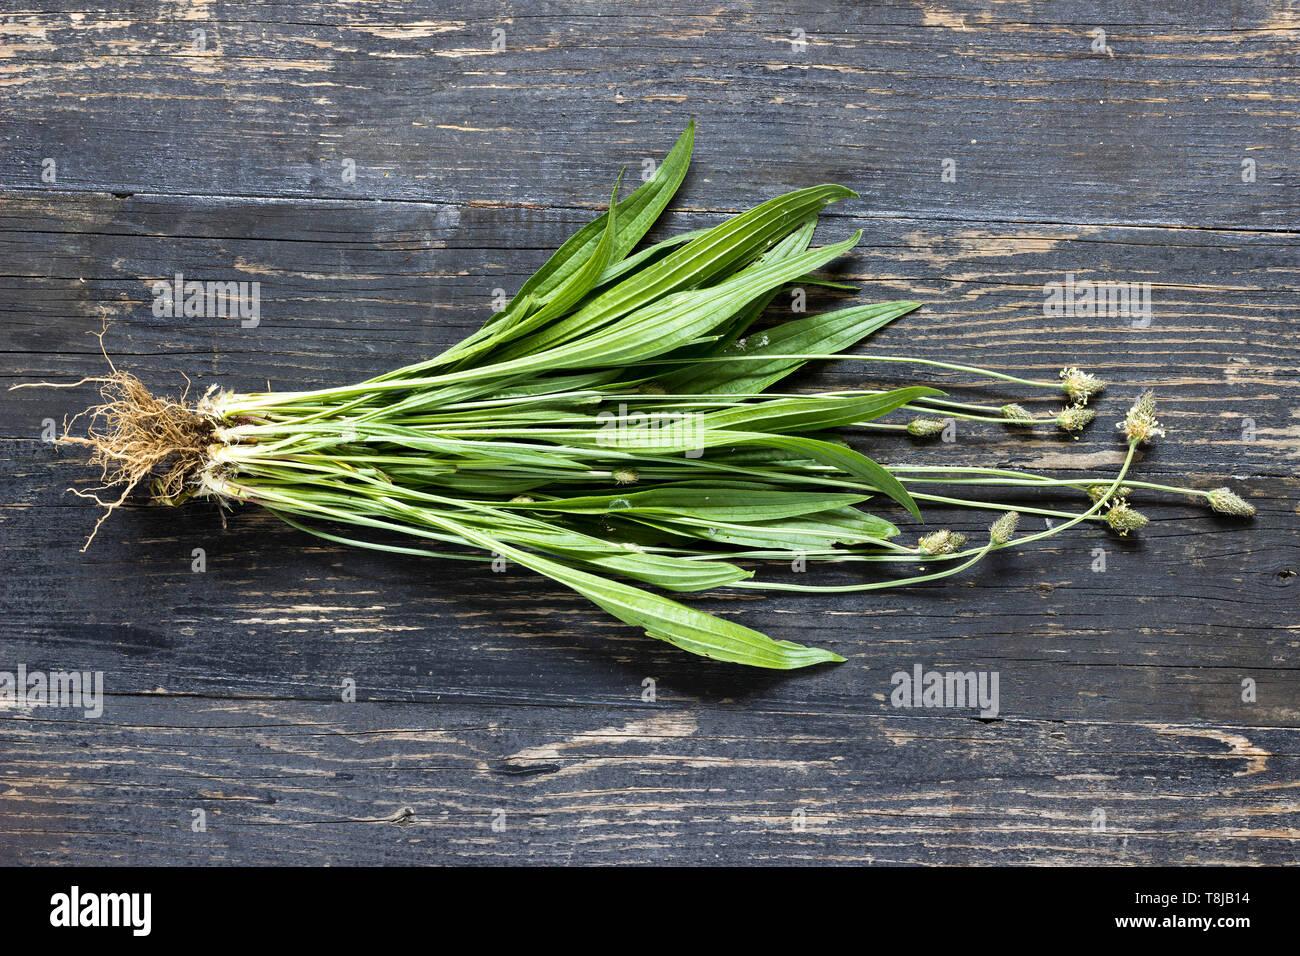 Whole plant ribwort plantain - (Plantago Lanceolata) on a wooden background - Stock Image